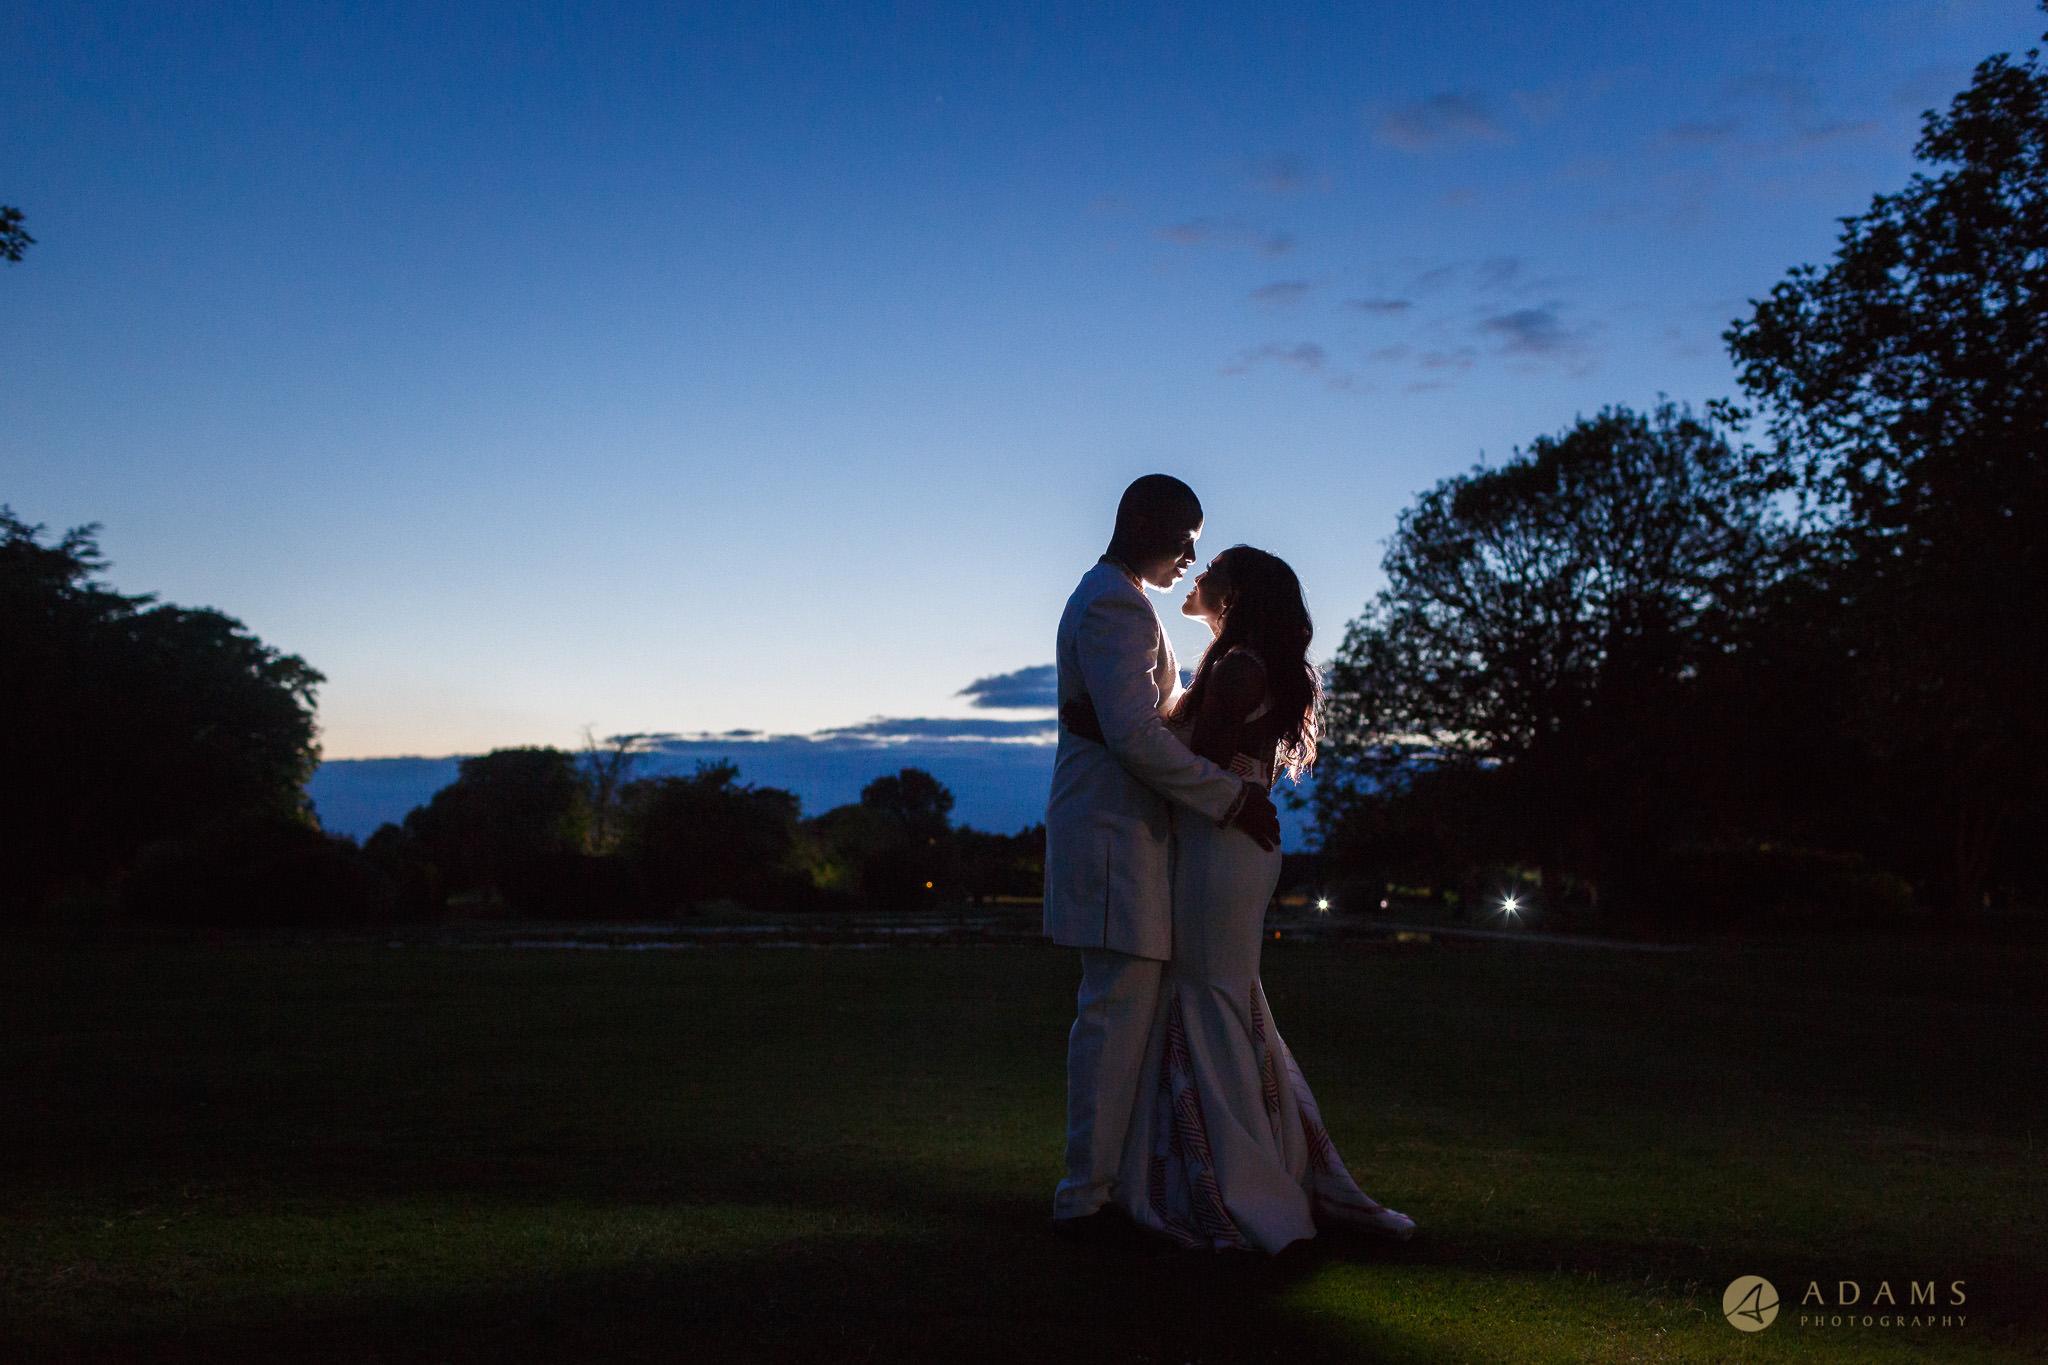 Boreham House wedding photographer couple hugging